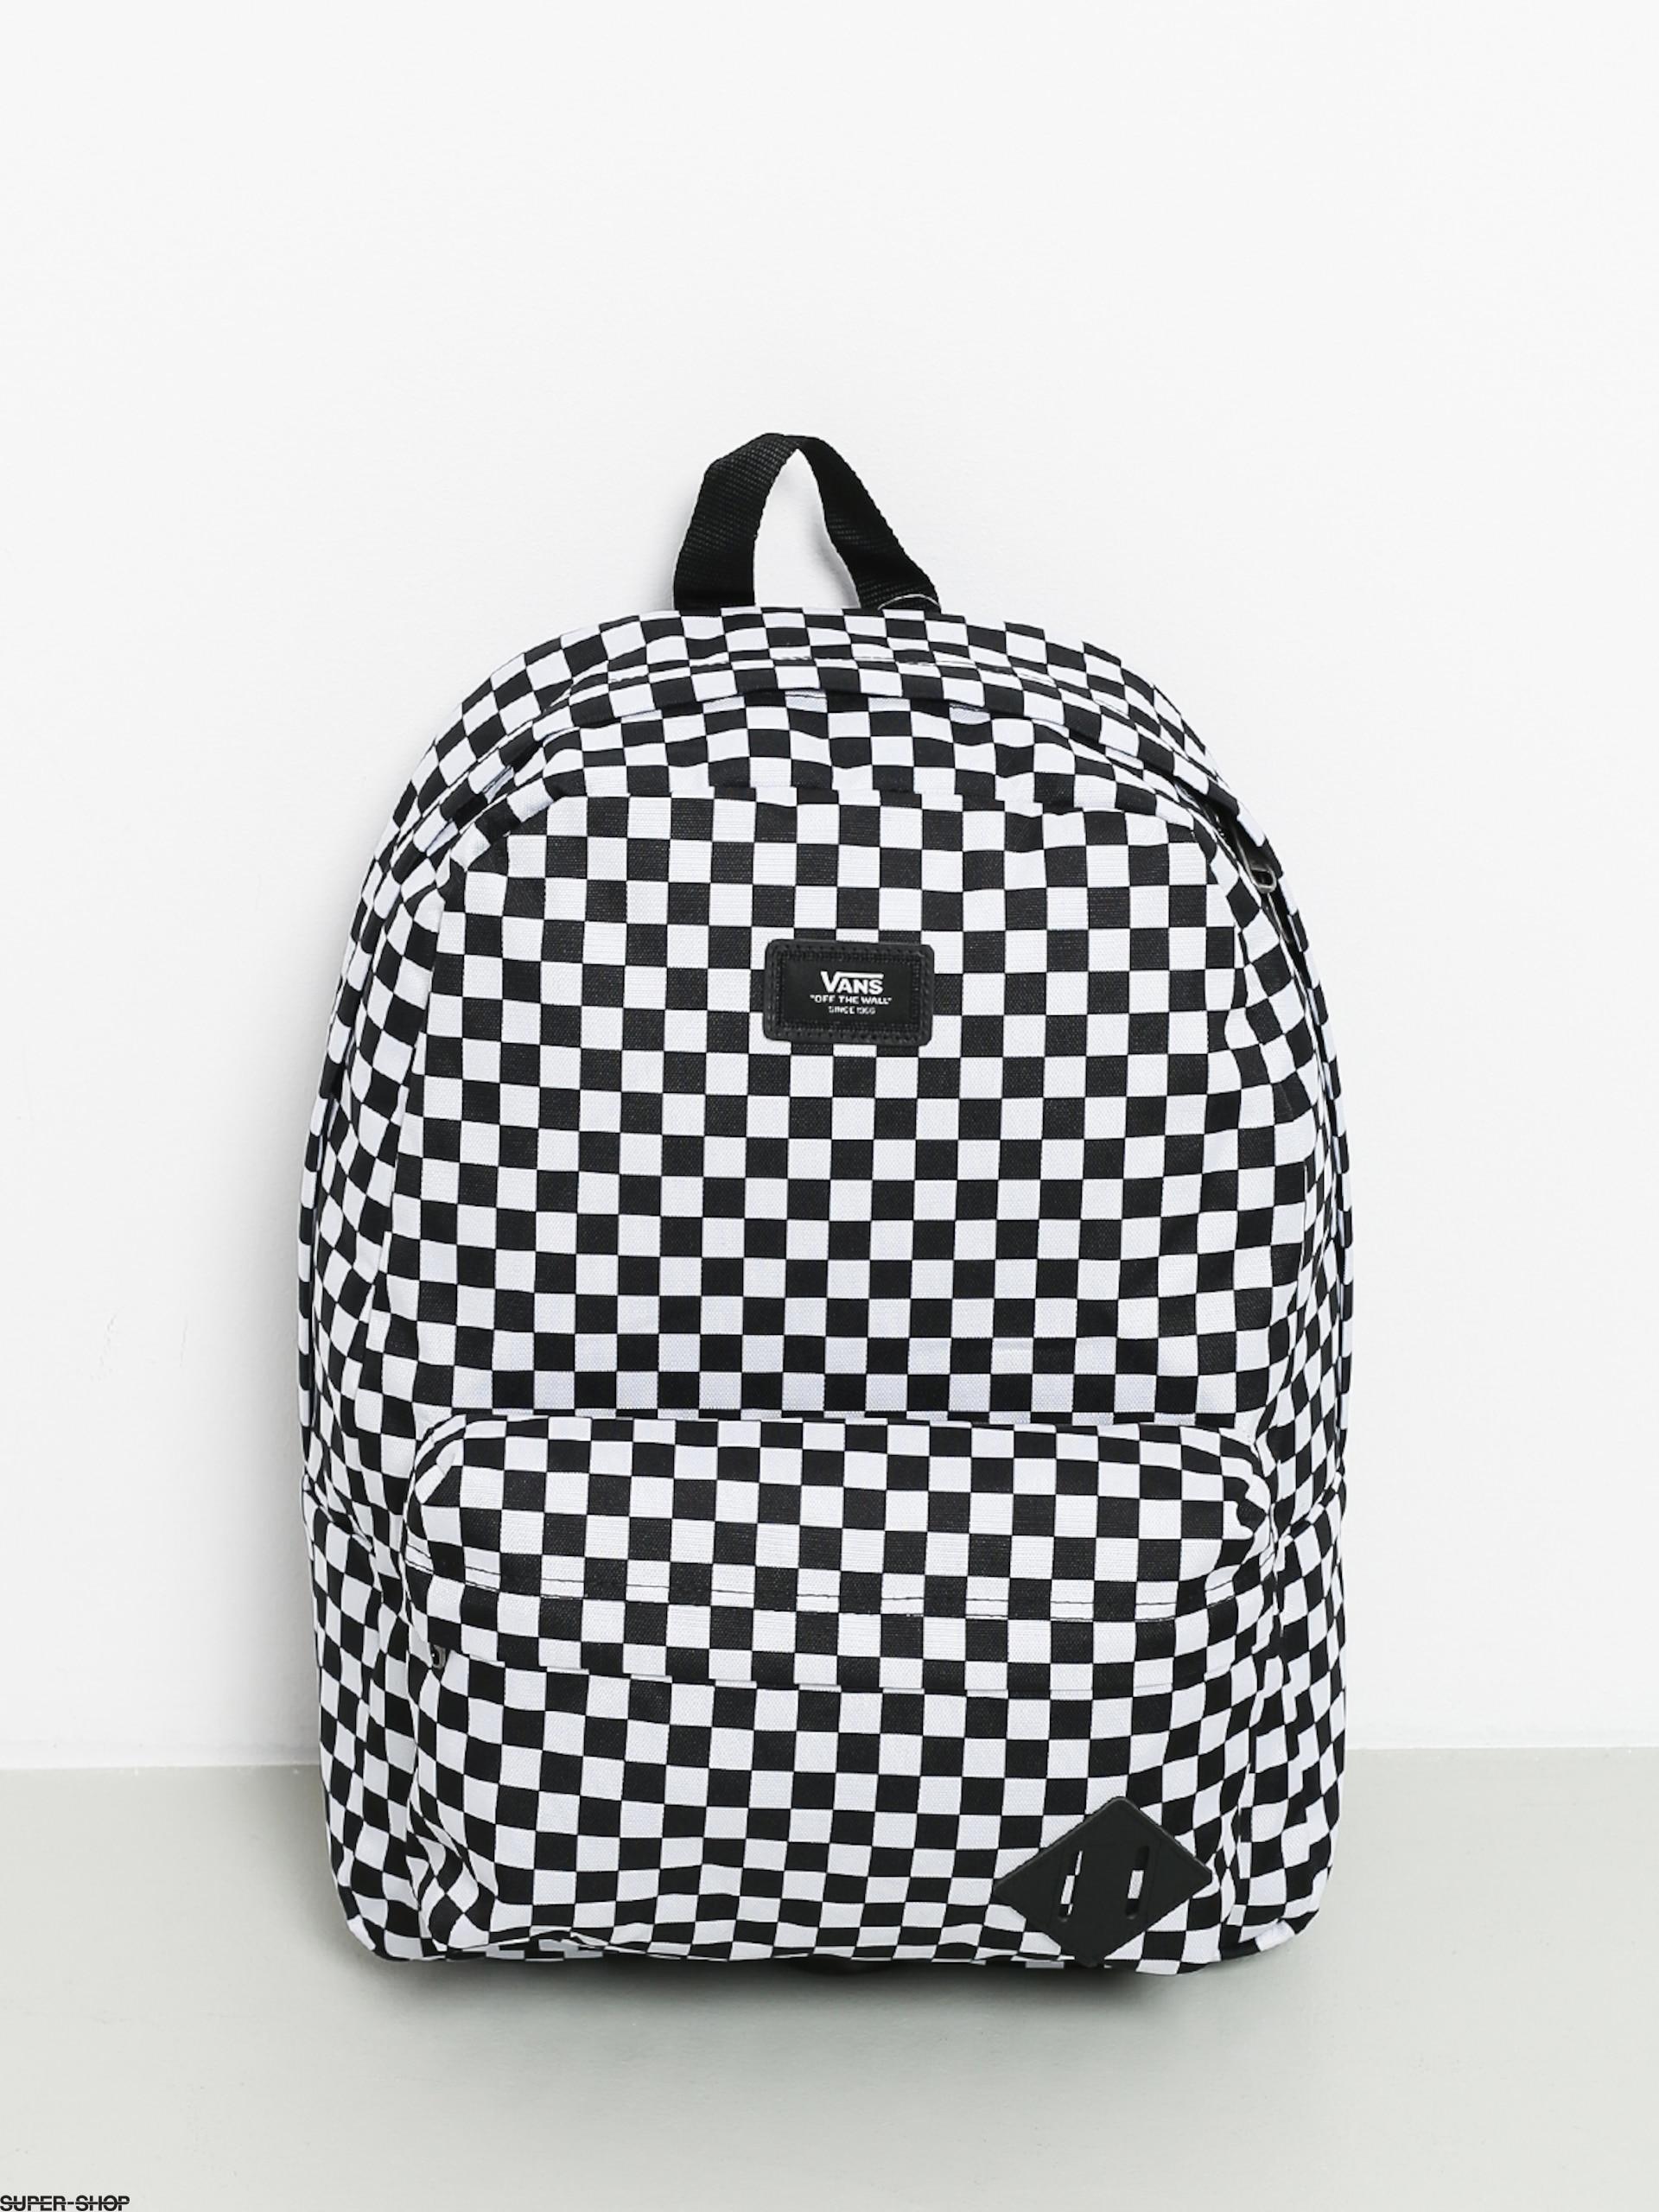 Vans Vans Cooler Bag Tasche BlackWhite Check